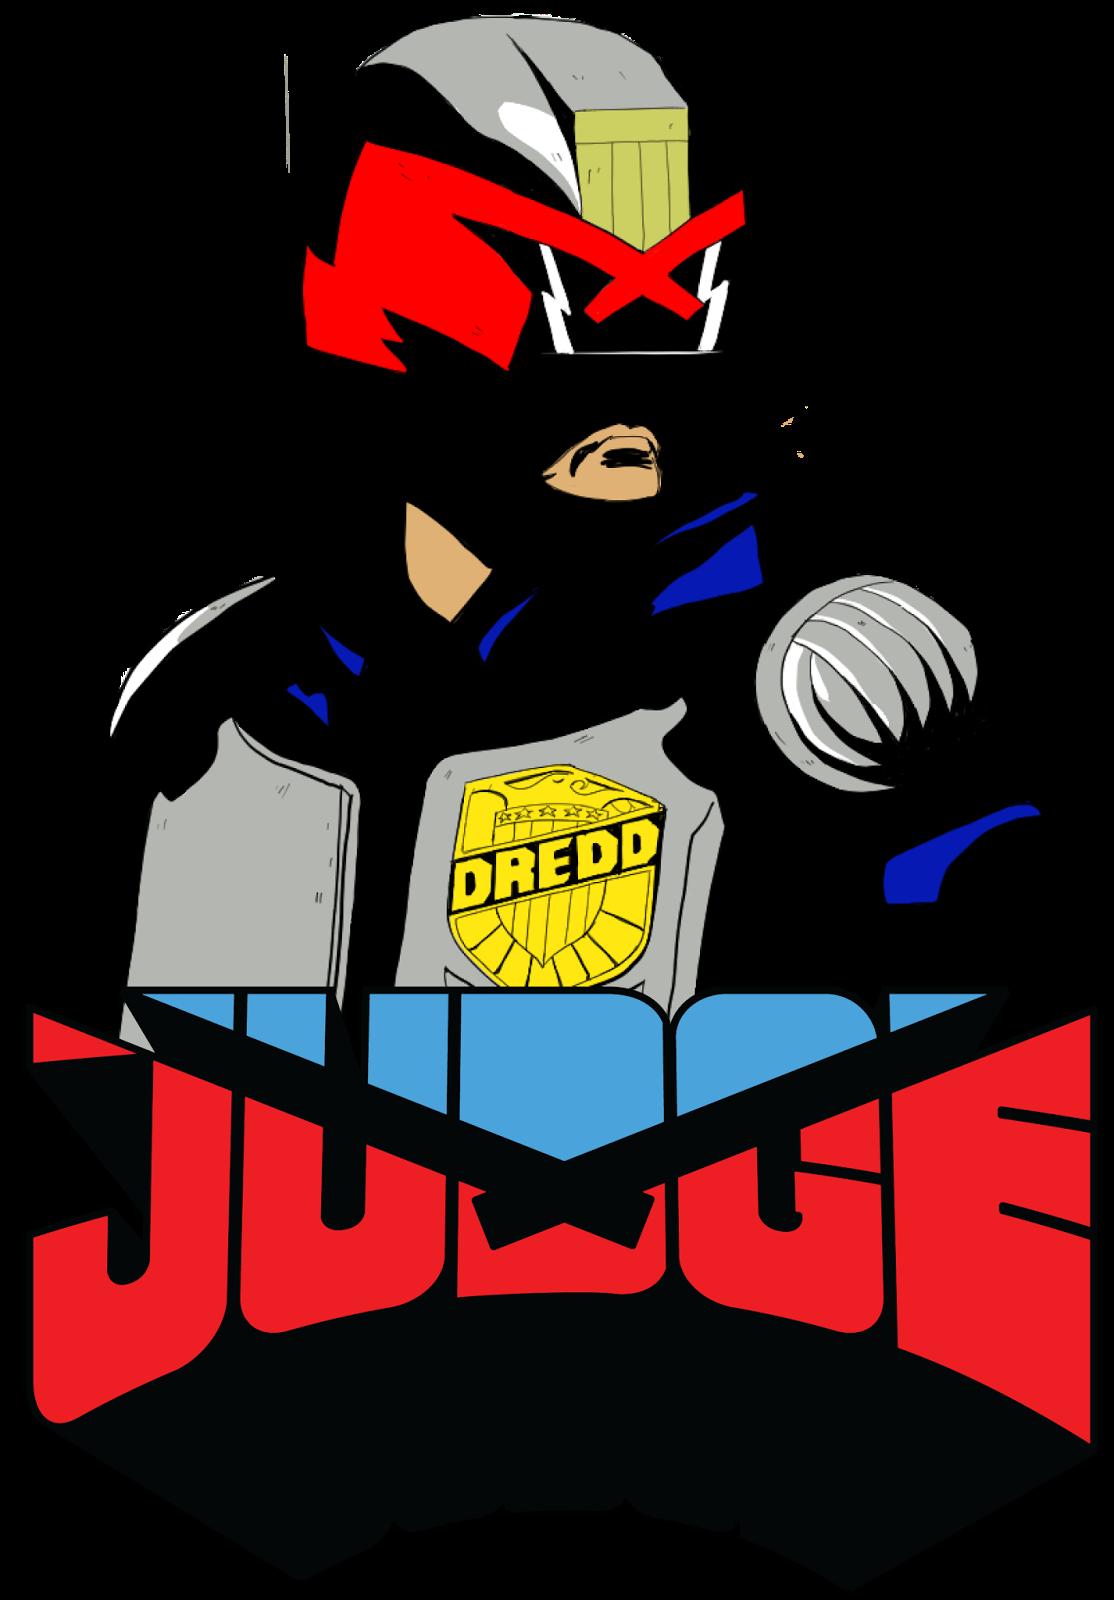 Thetimbrown dredd stickers just. Judge clipart desk